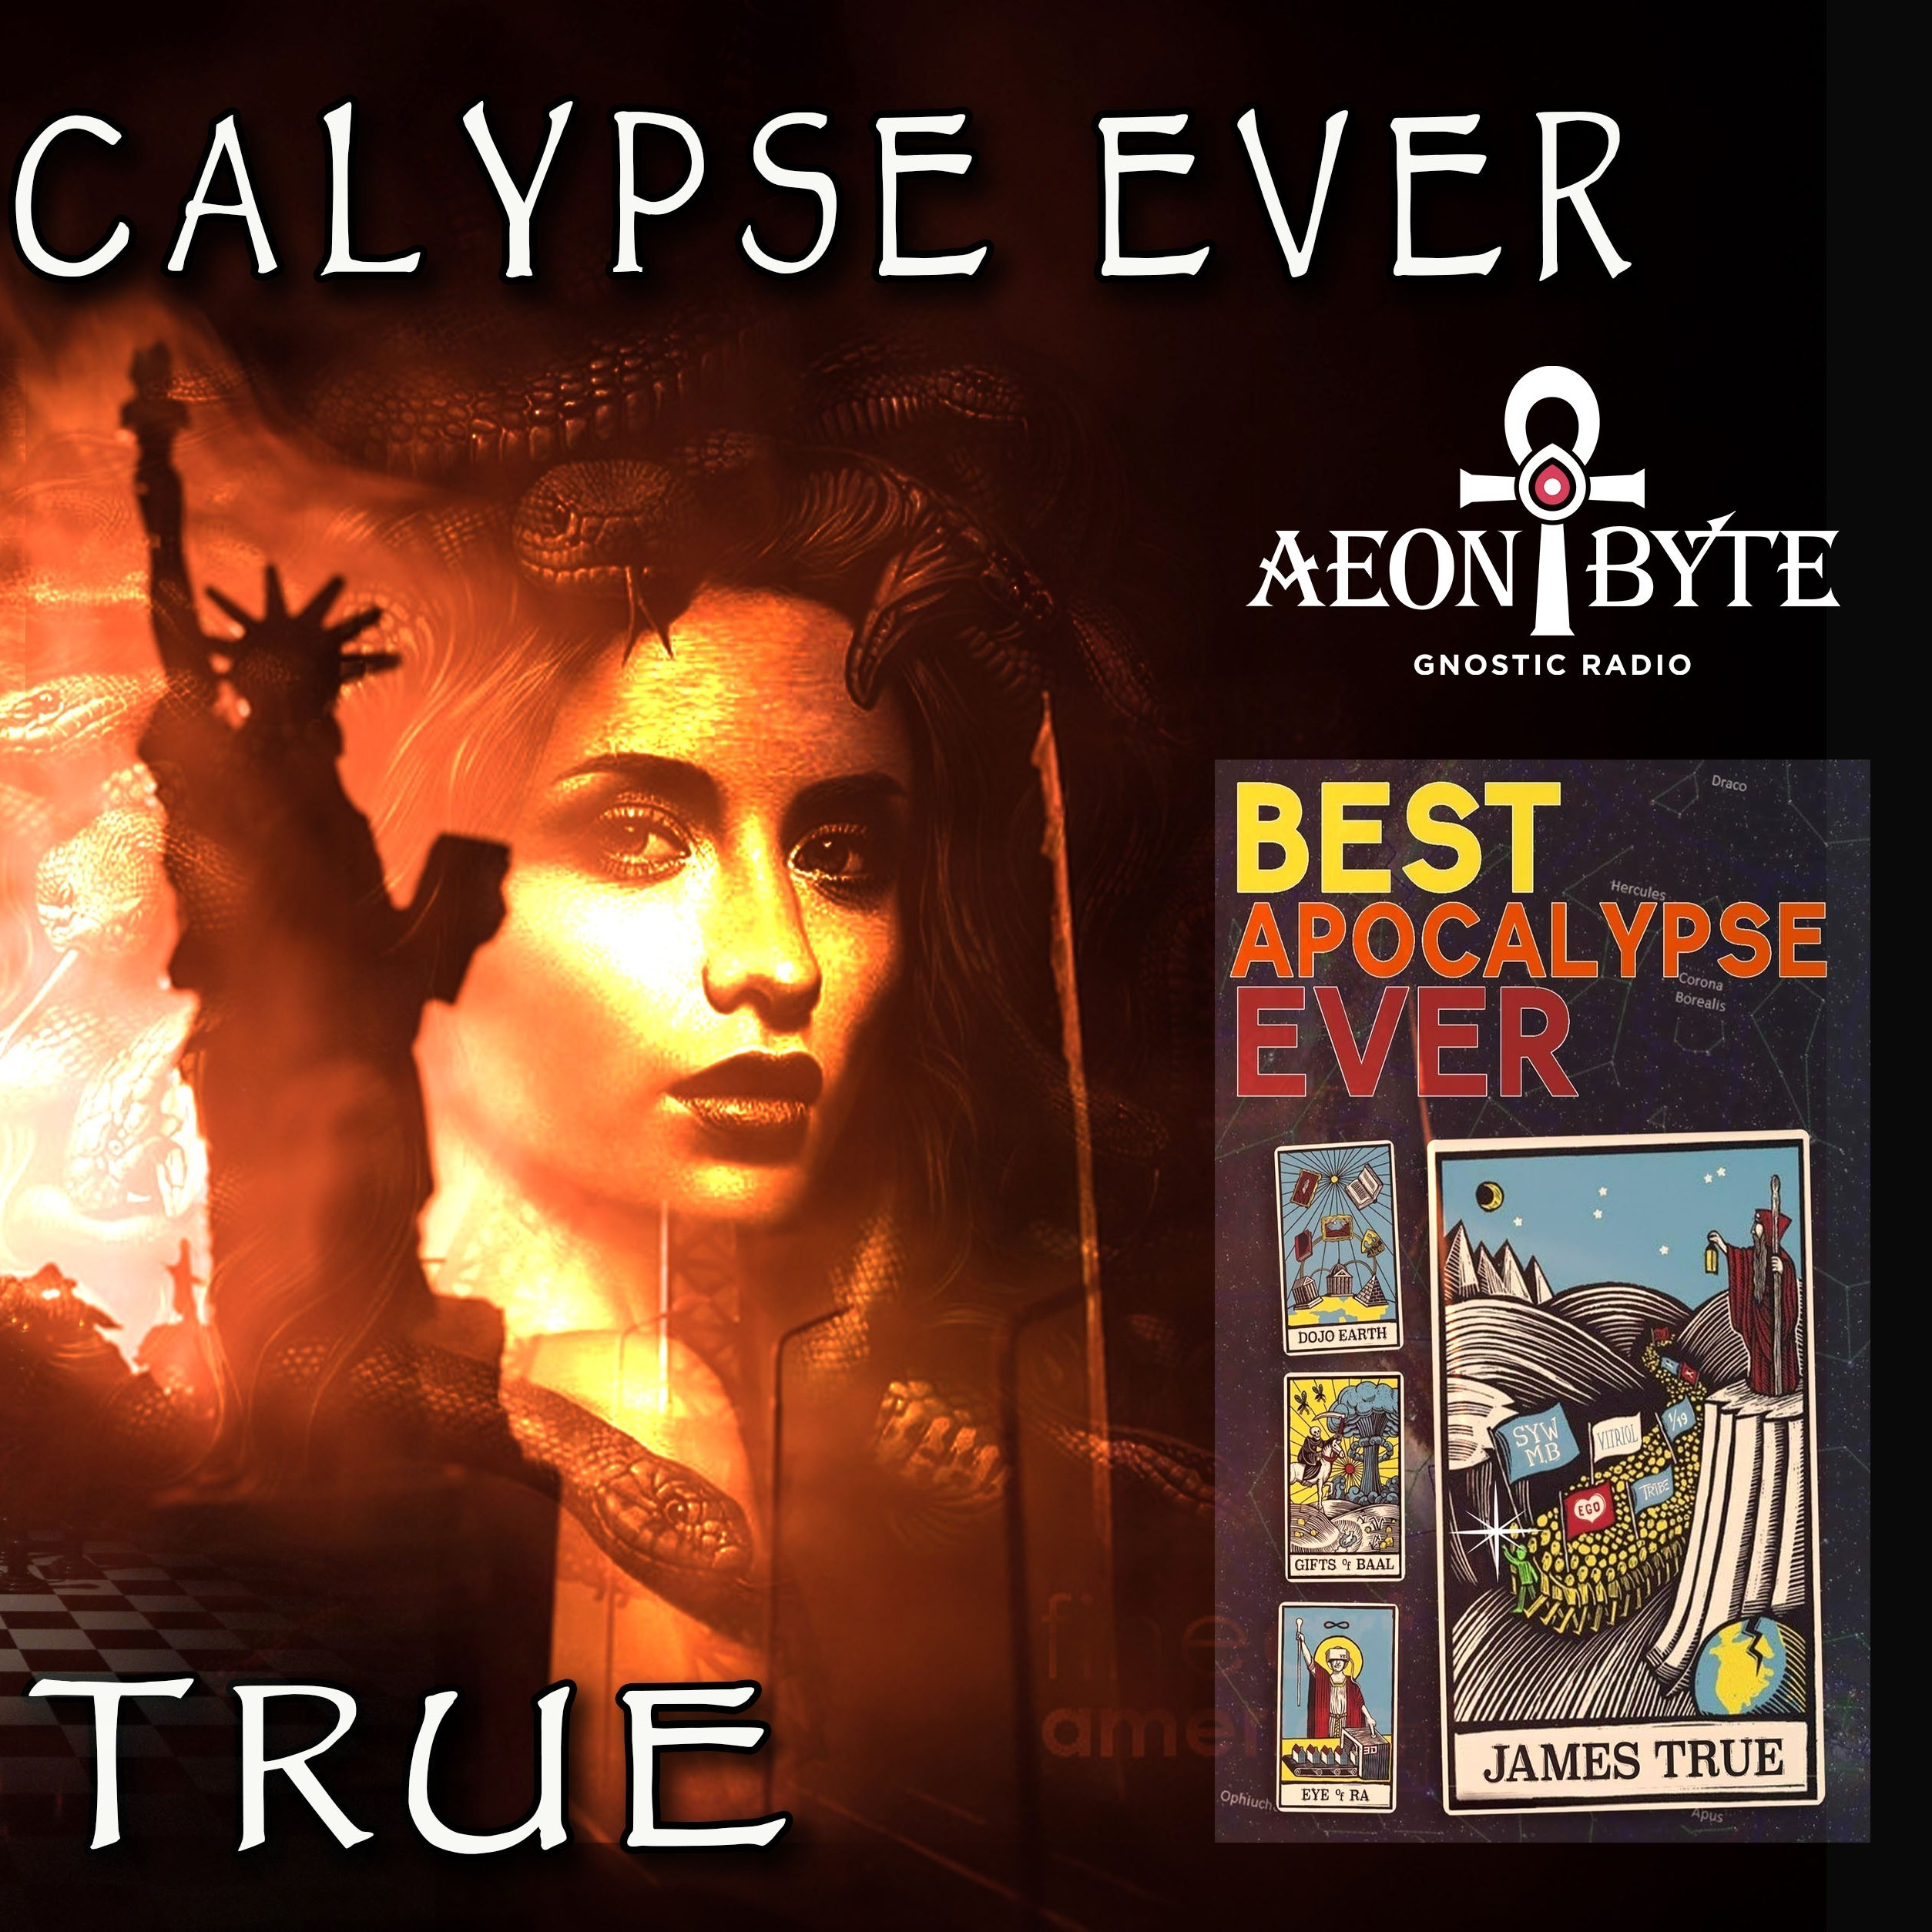 James True on the Best Apocalypse Ever